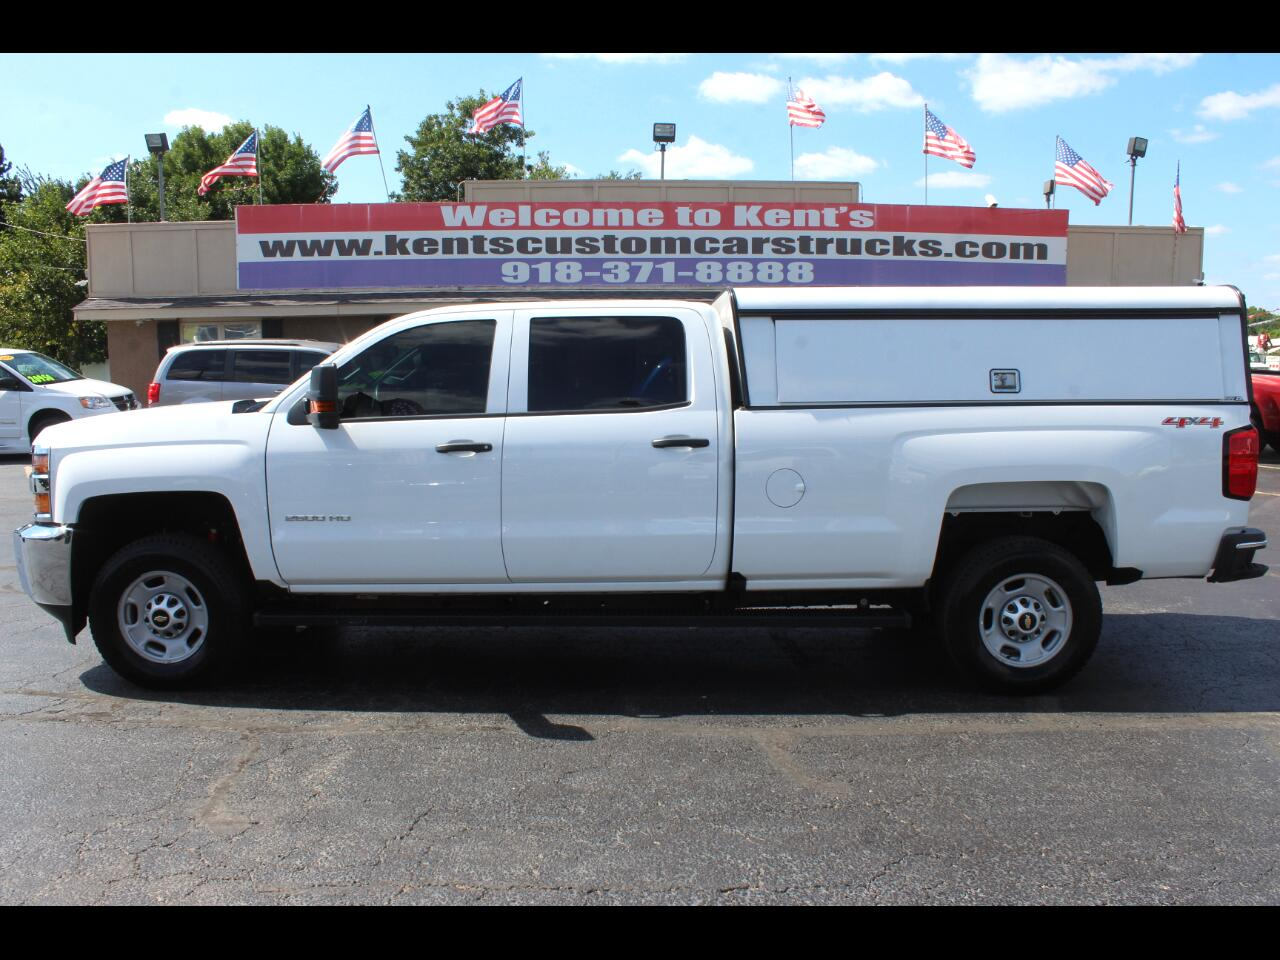 2017 Chevrolet Silverado 2500HD Work Truck Crew Cab 4WD Long Bed